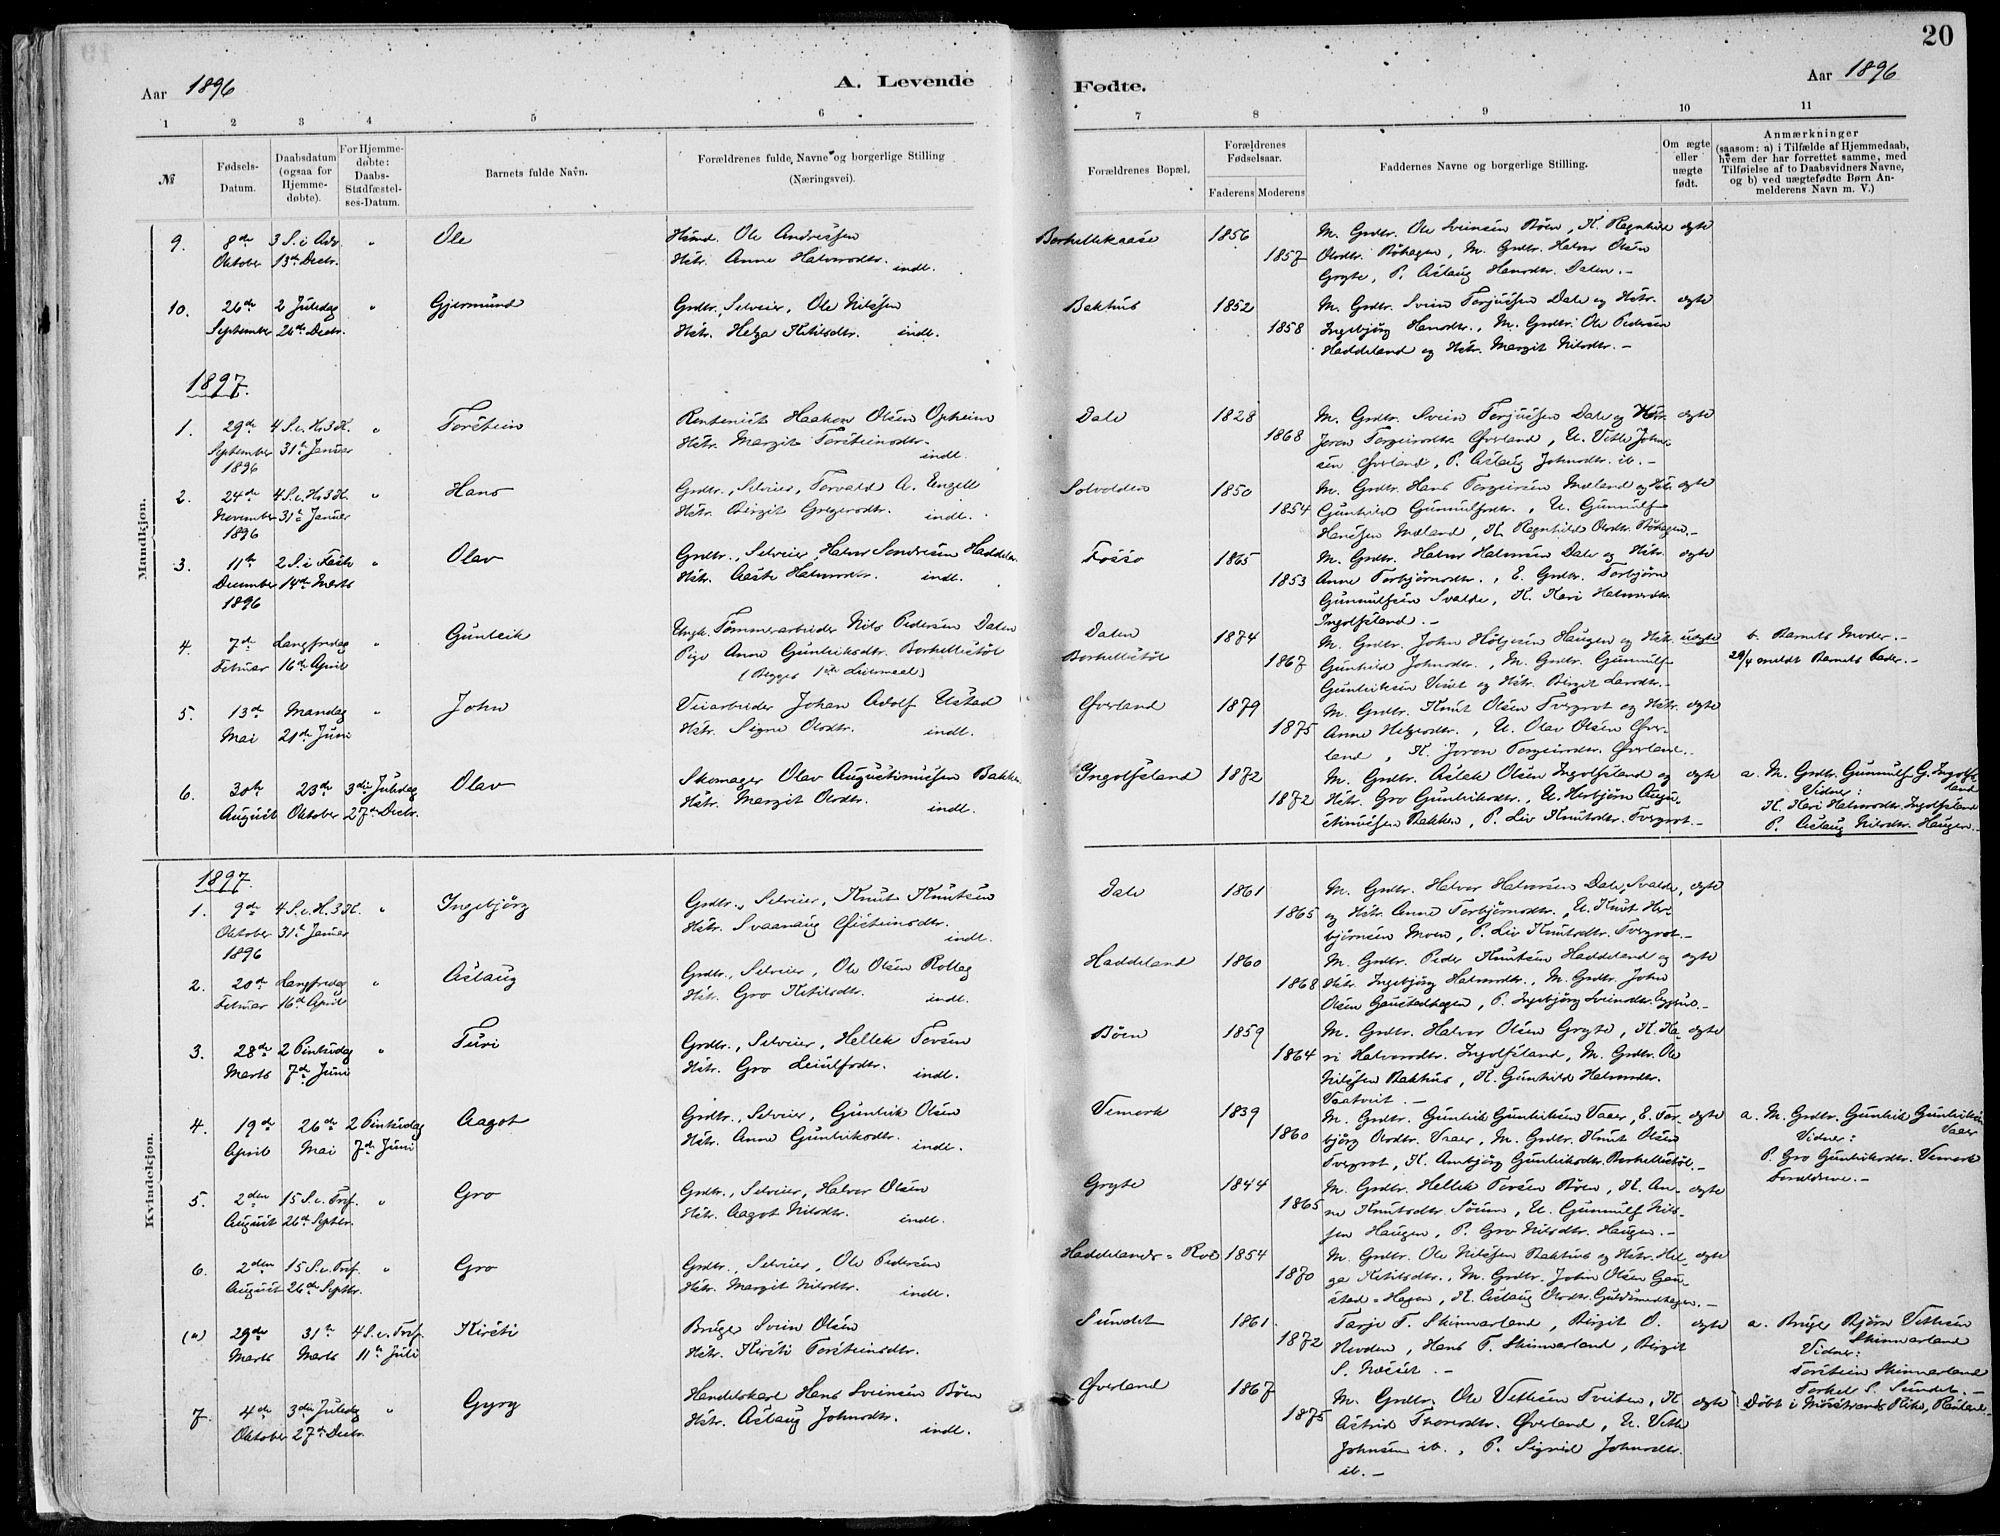 SAKO, Rjukan kirkebøker, F/Fa/L0001: Ministerialbok nr. 1, 1878-1912, s. 20